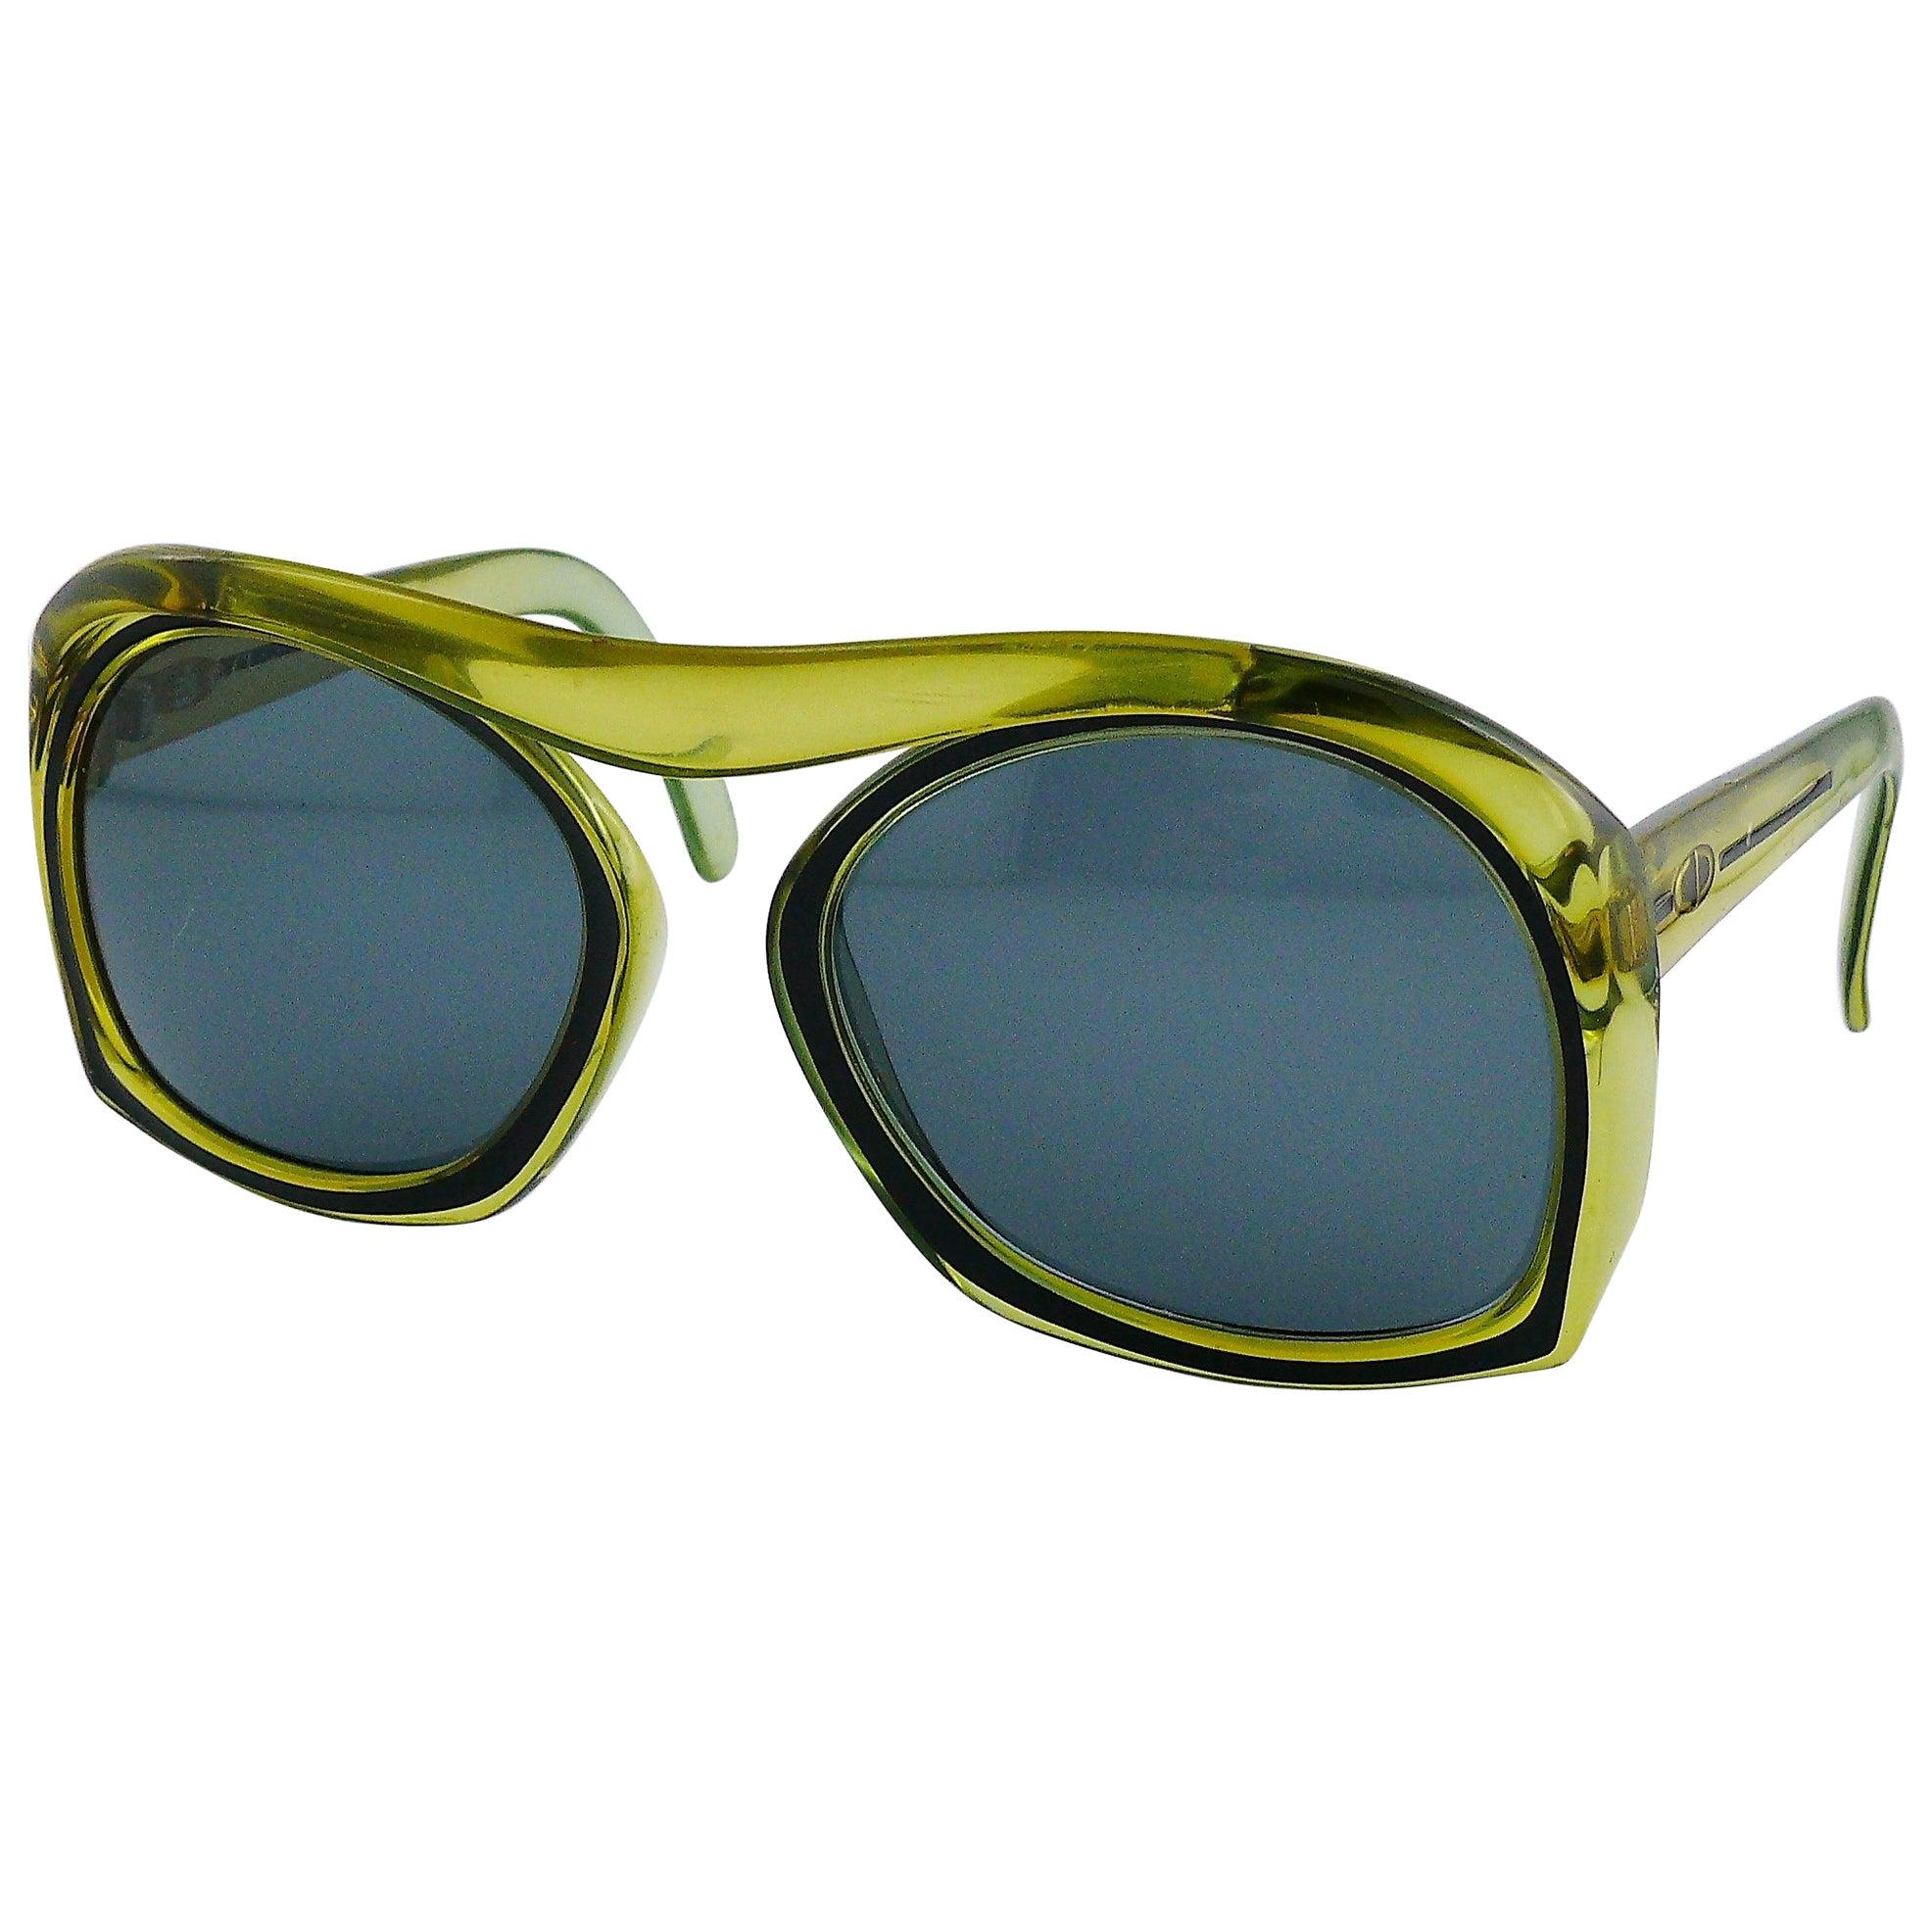 Christian Dior Bridgeless Oversized Space Age Sunglasses Mod. 2043